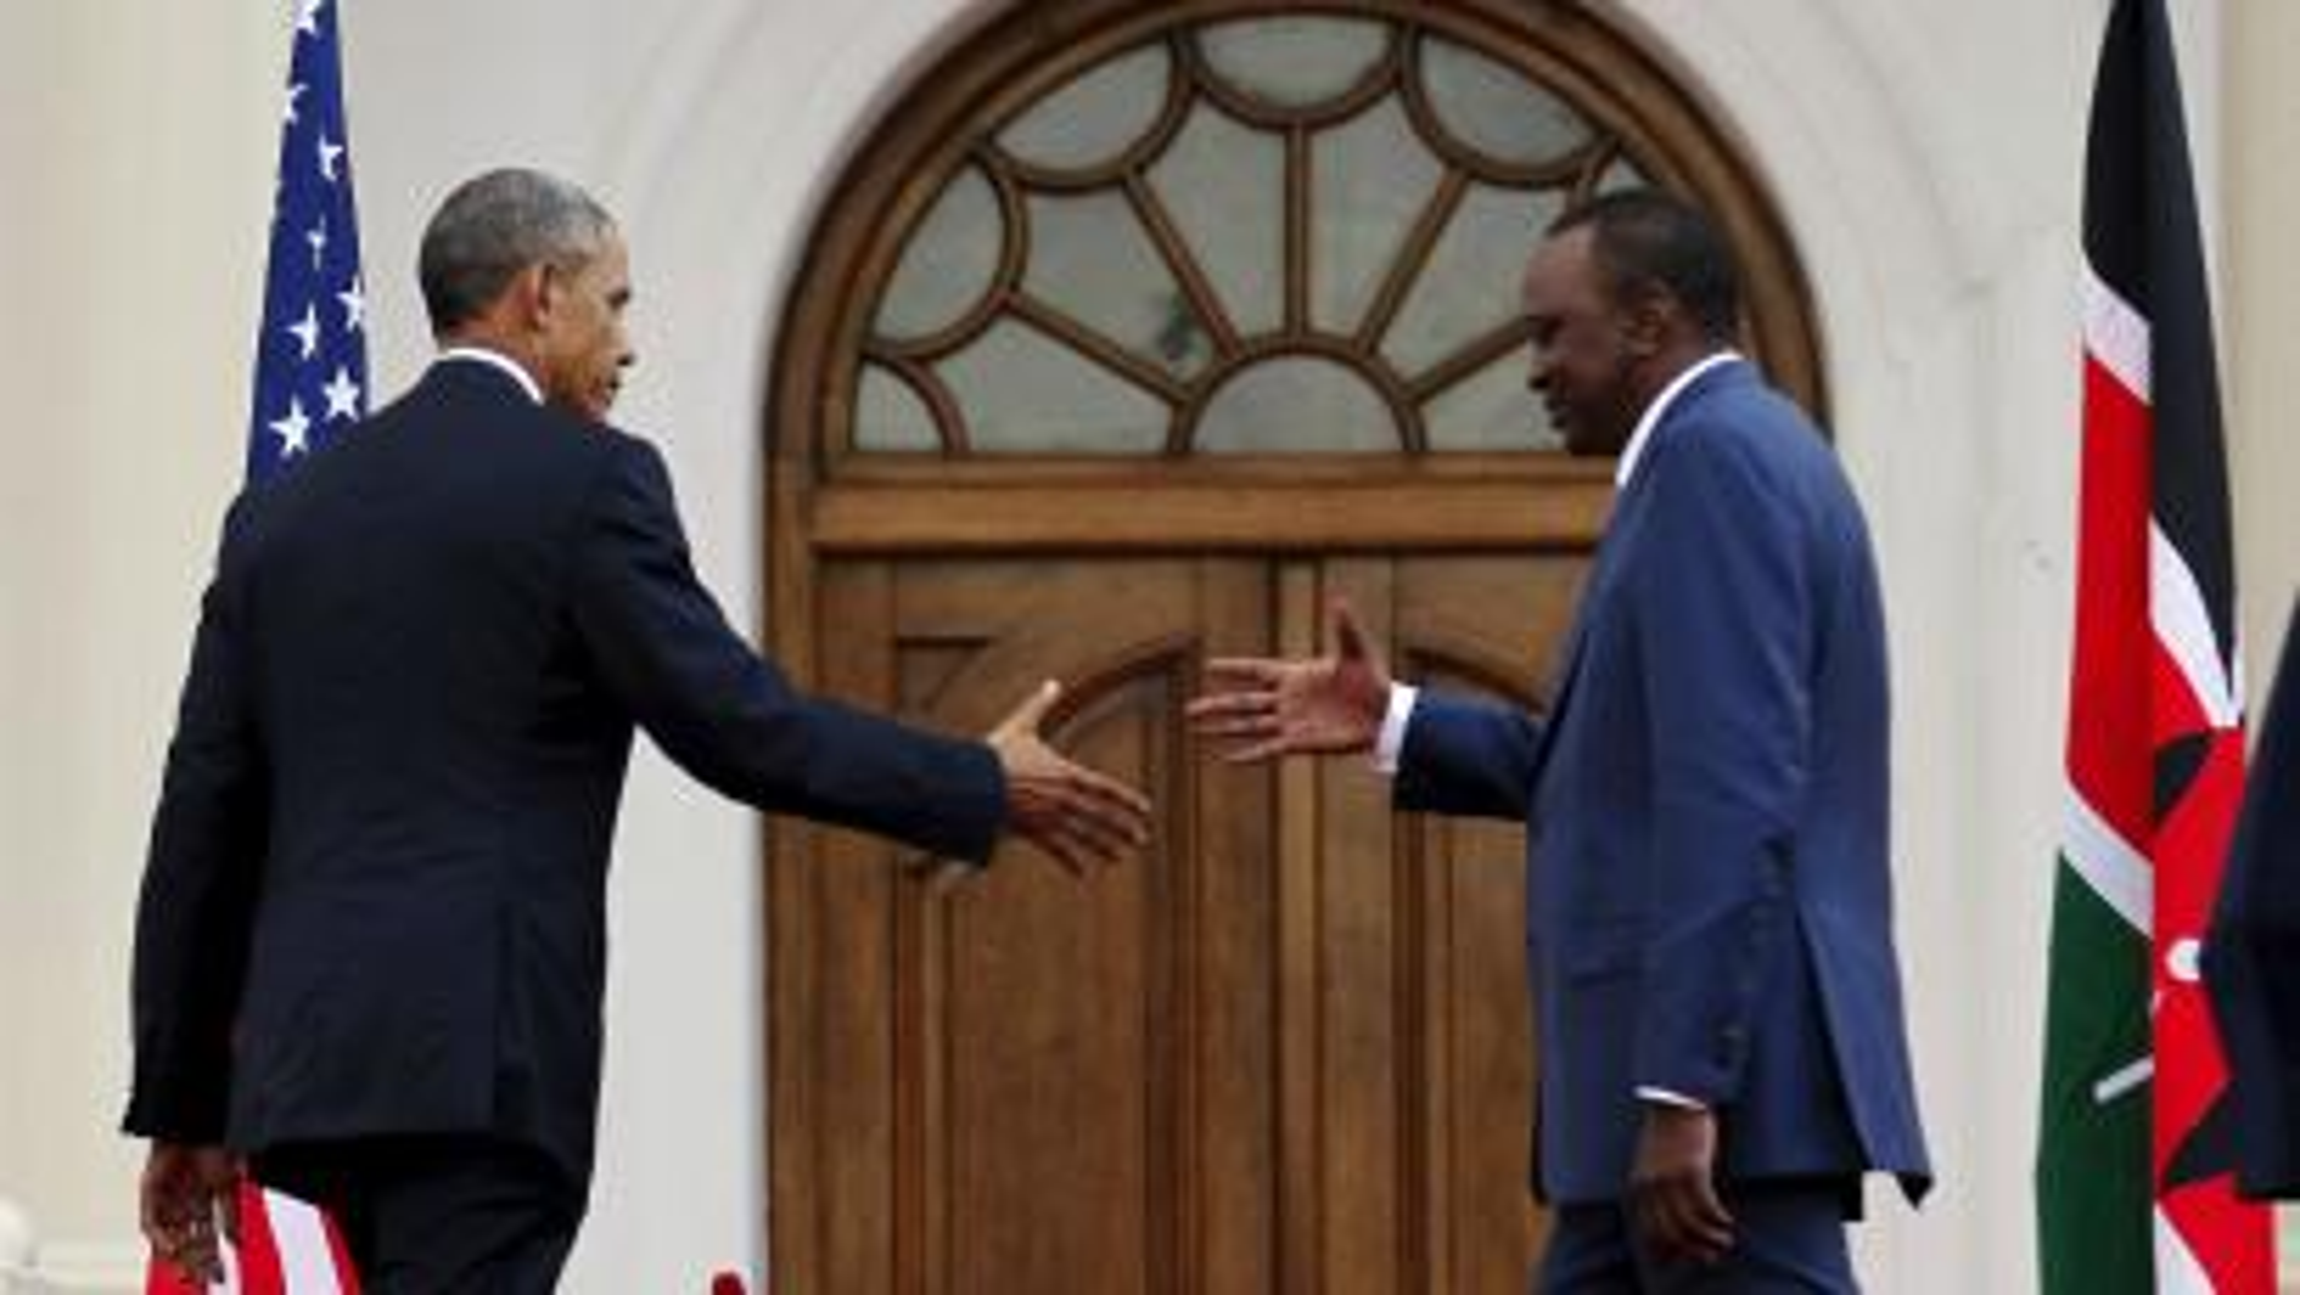 Obama shakes hands with Kenya's president Uhuru Kenyatta in Nairobi.